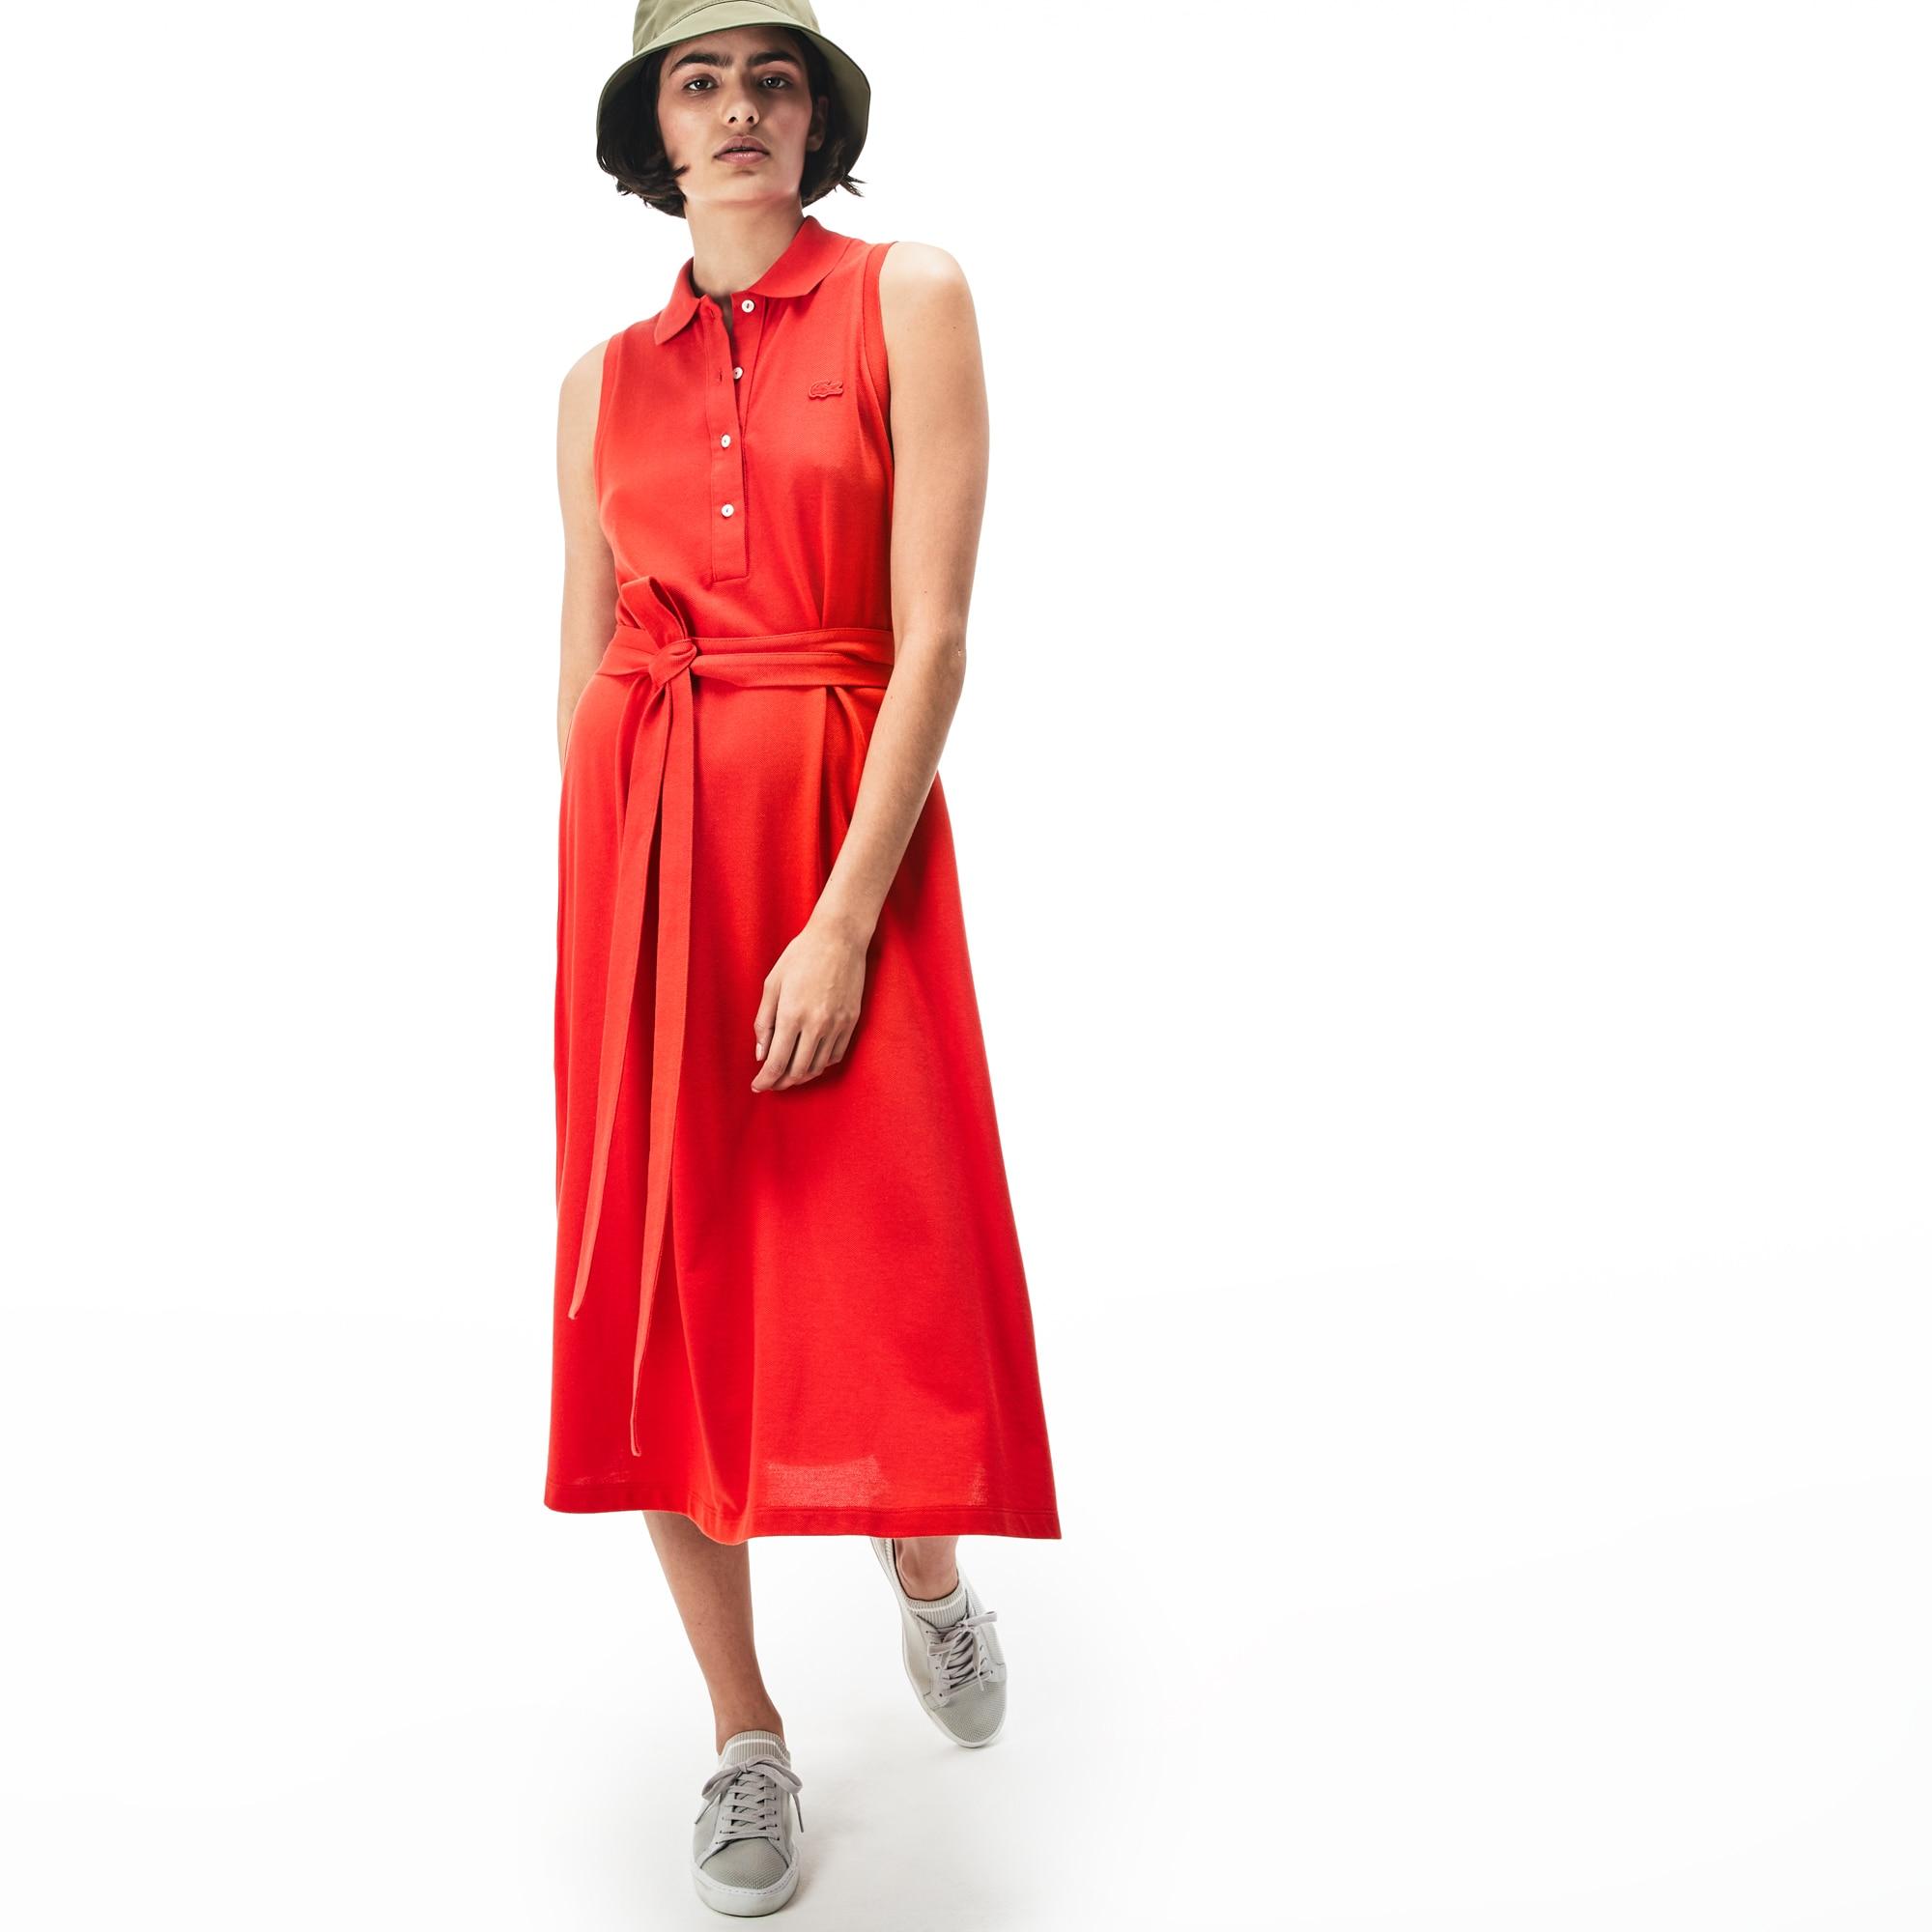 7daaa400e7 Full Skirt Shirt Dress Uk - Gomes Weine AG